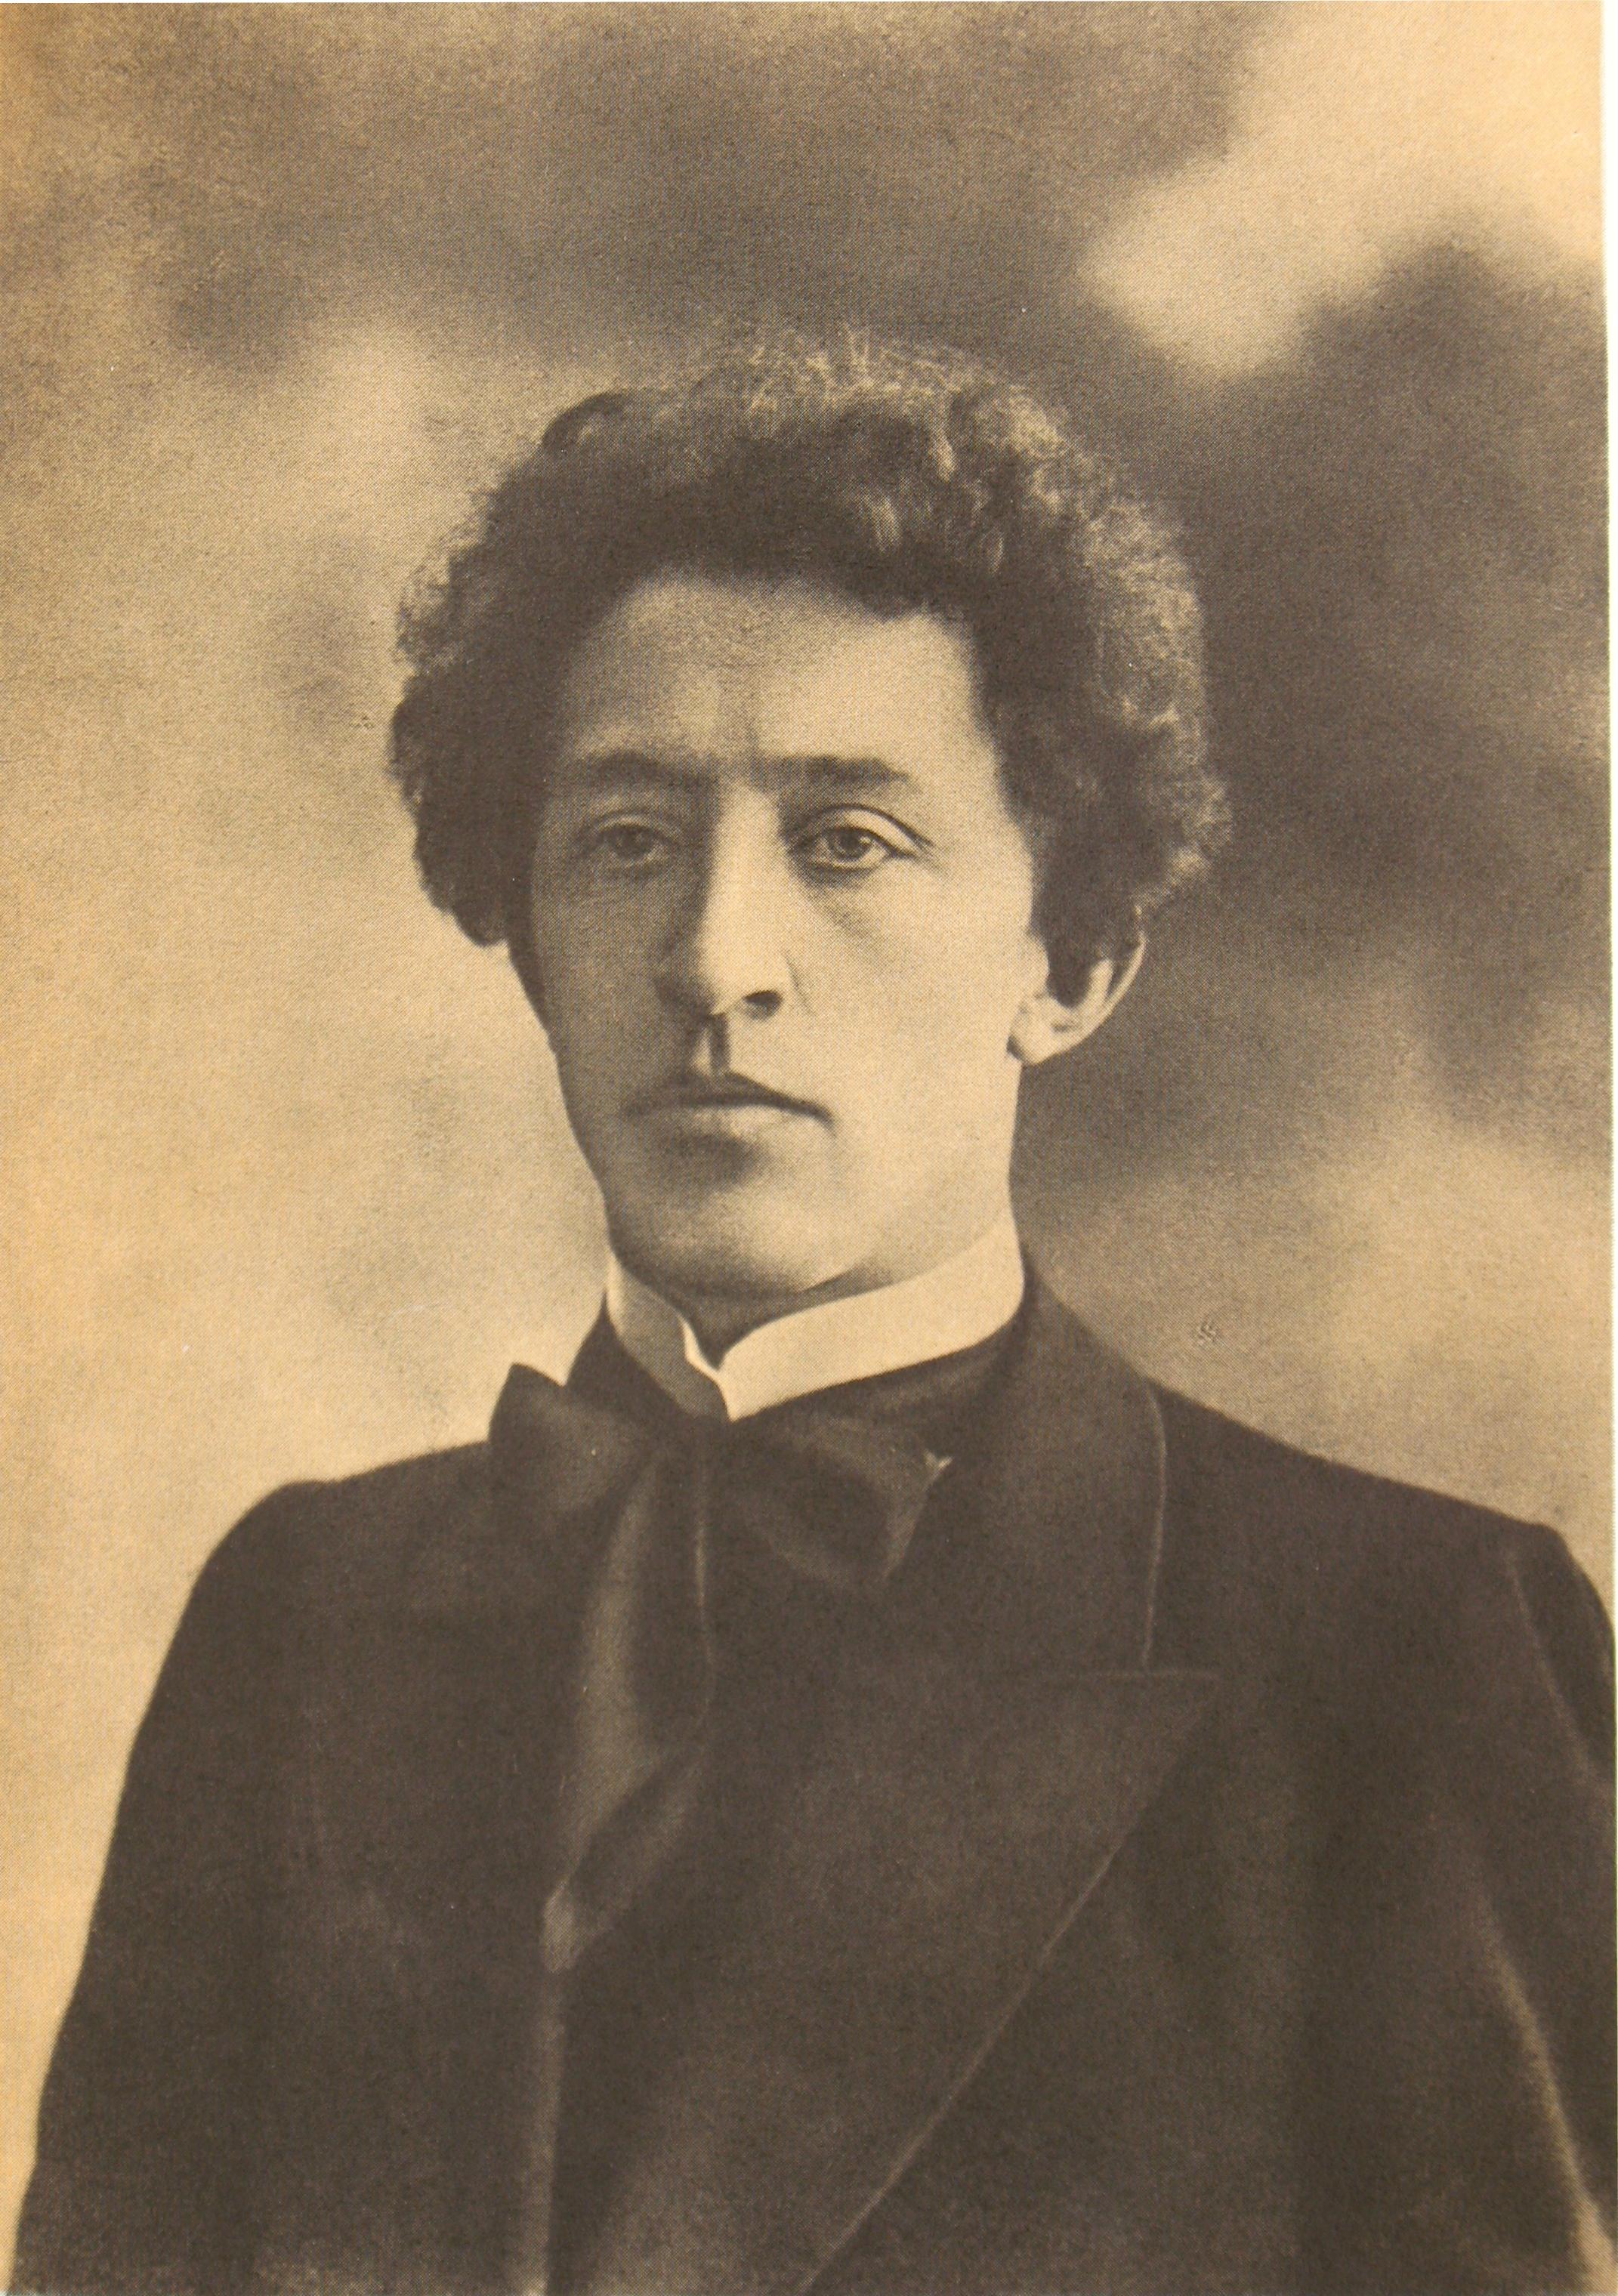 Alexander Blok / wikipedia